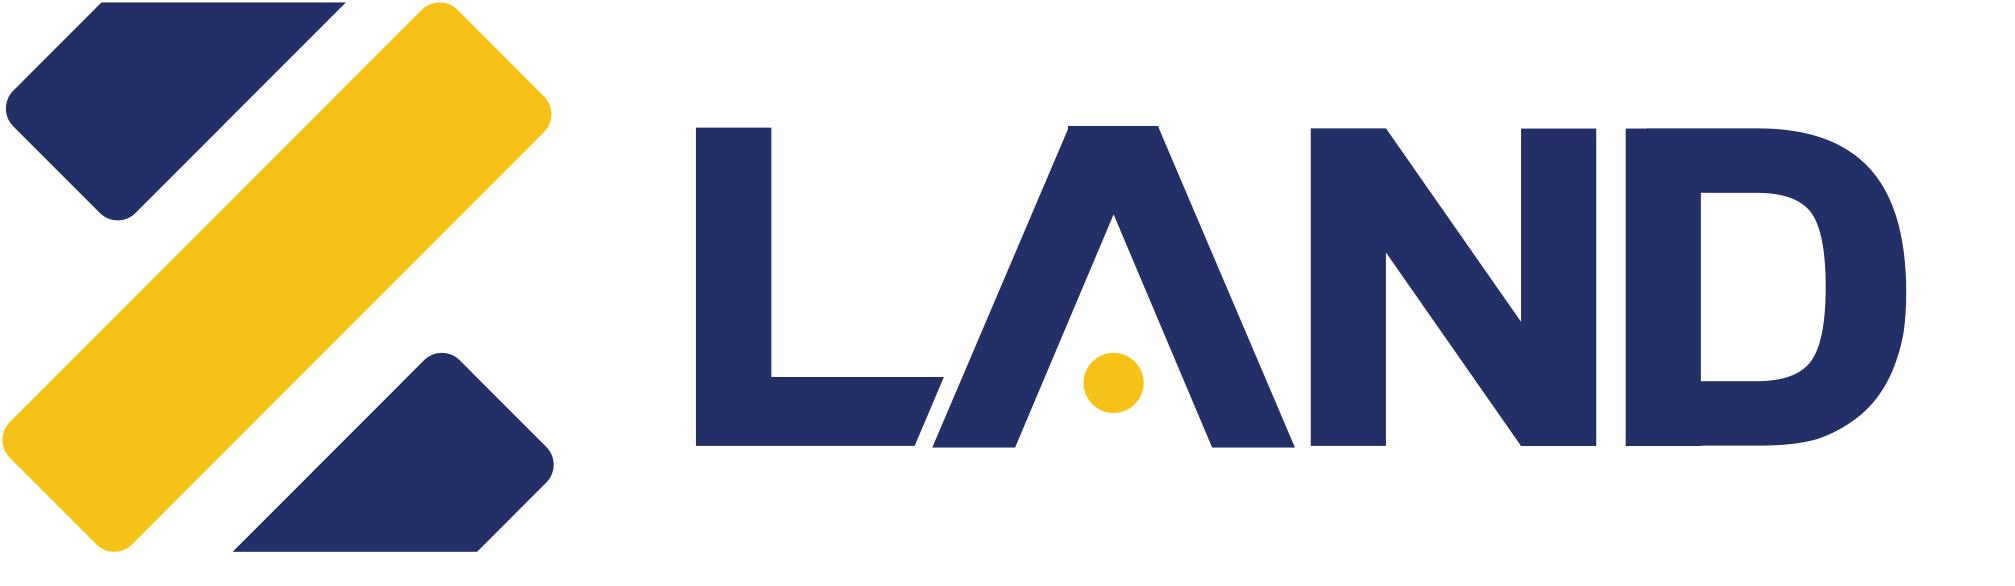 logo-zland-no-slogan